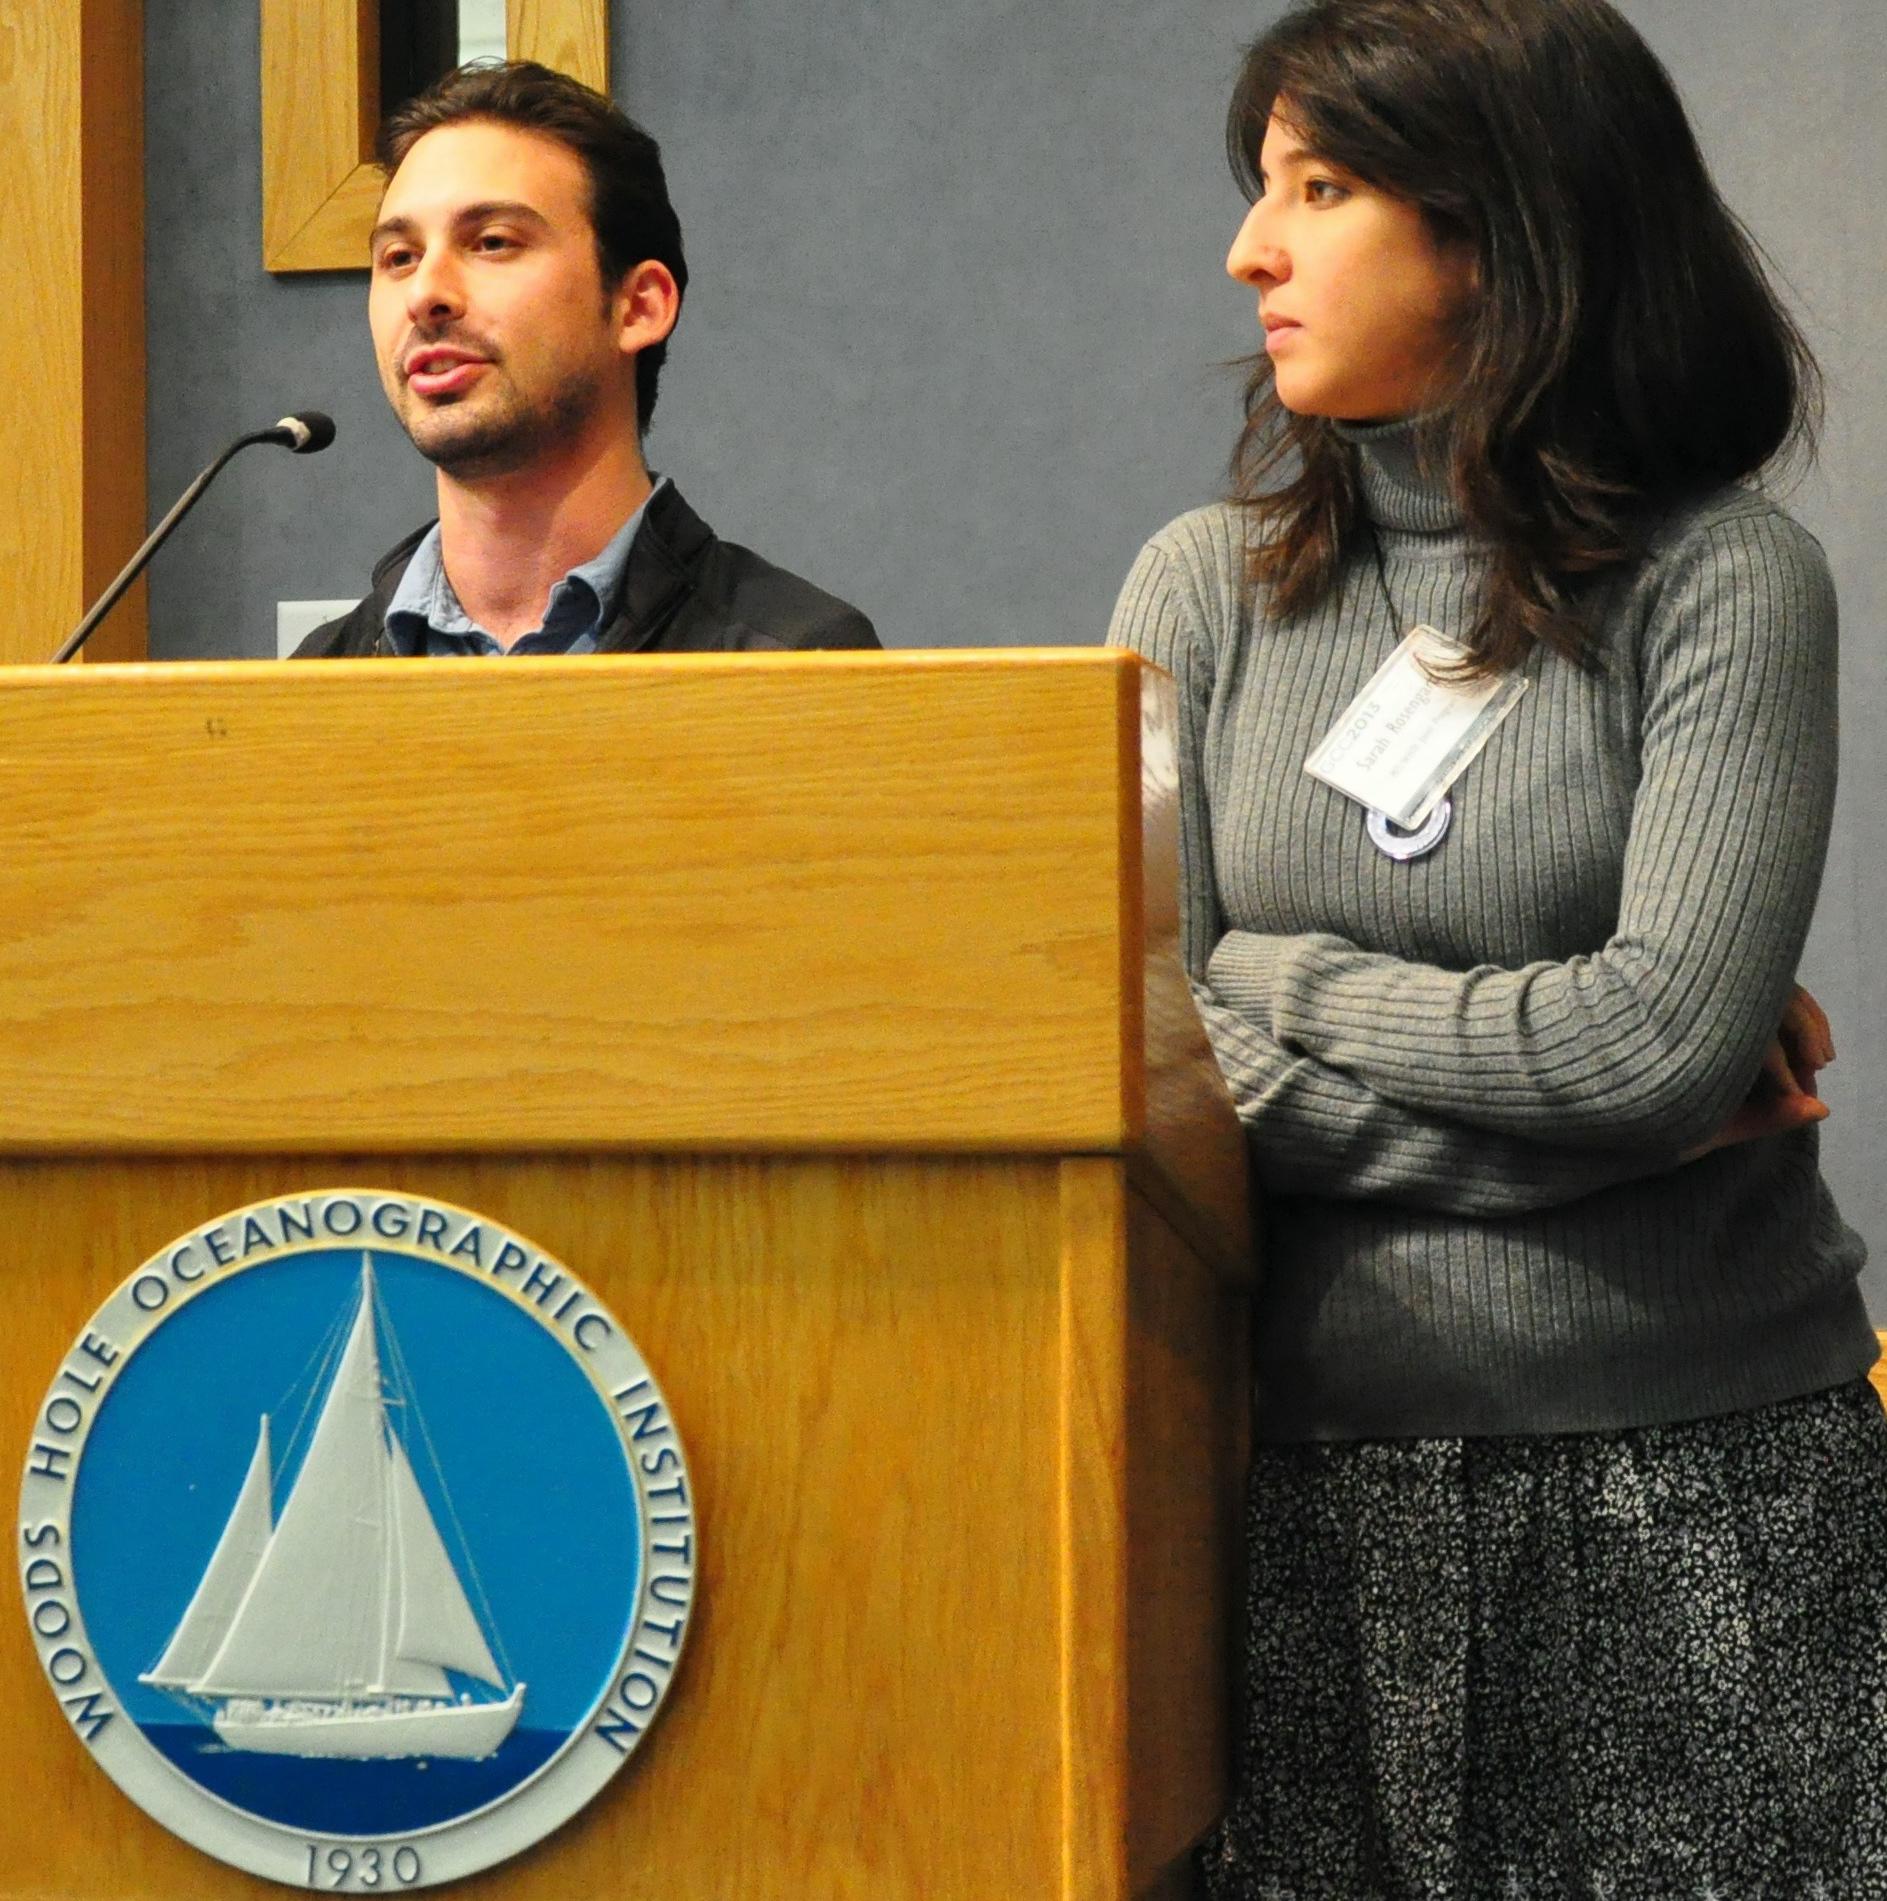 Daniel Rothenberg and Sarah Rosengard Photo: Allison Wing